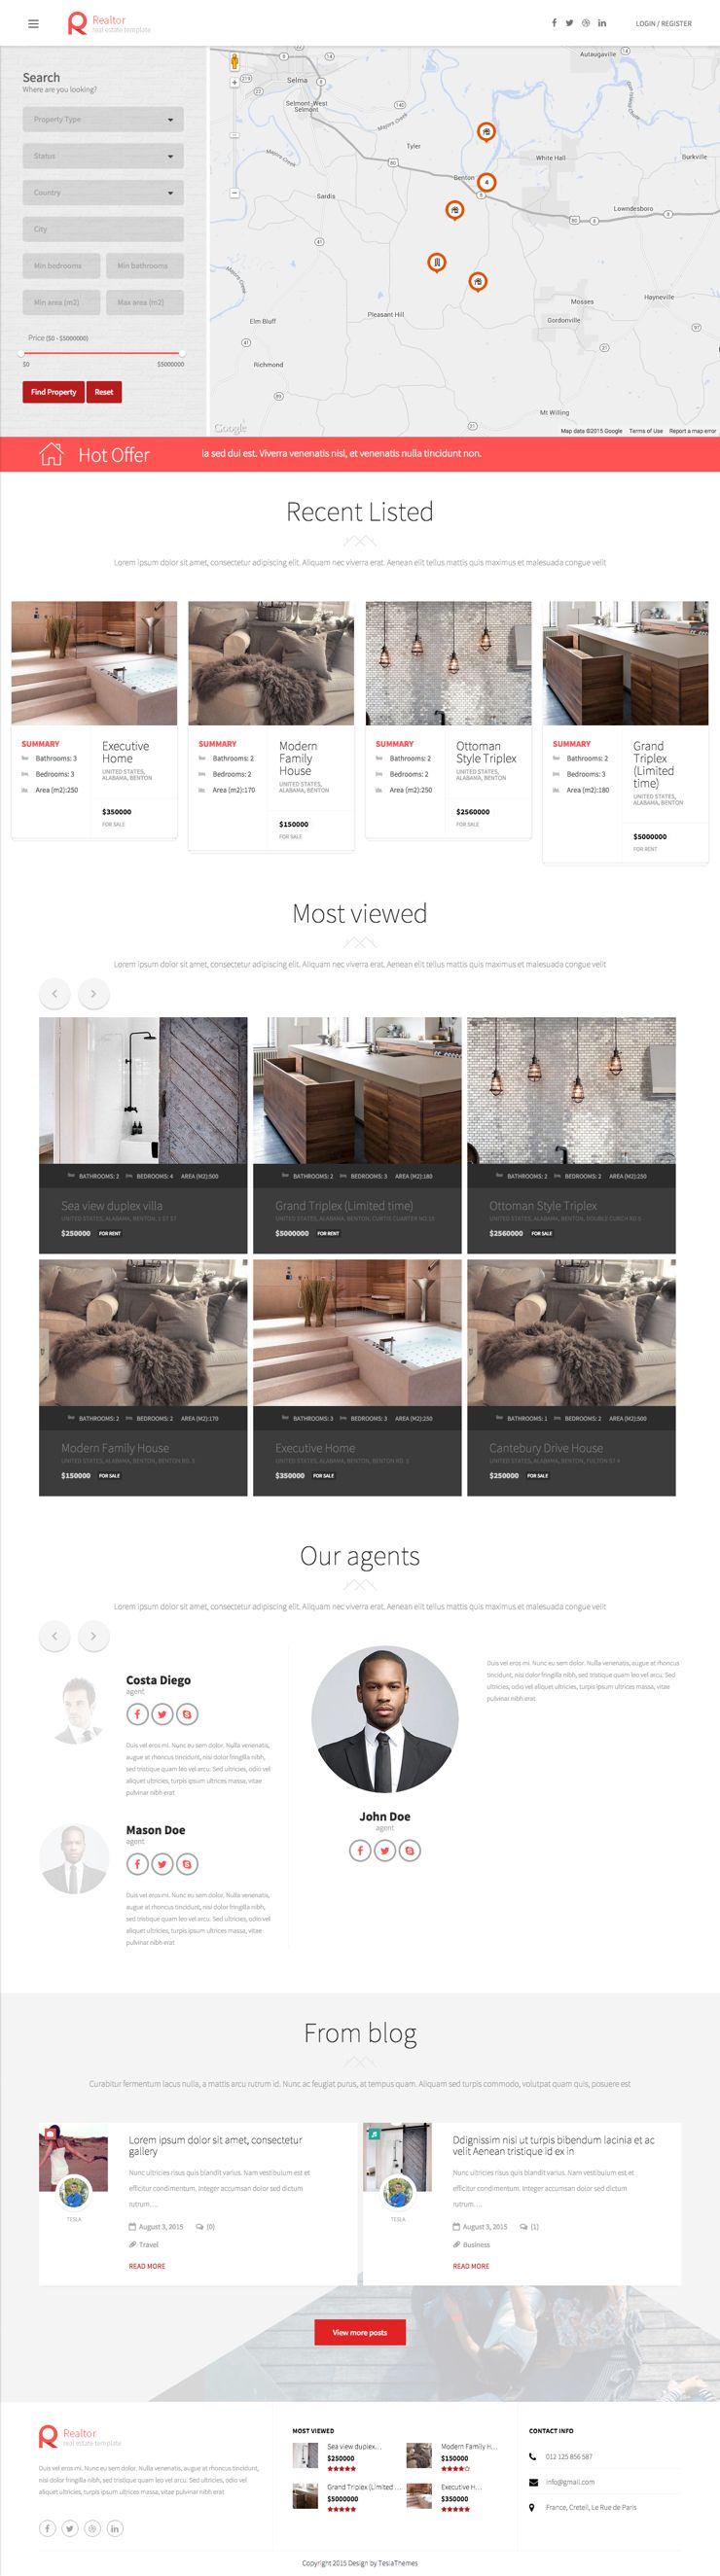 Realtor Real Estate Agents WordPress Theme